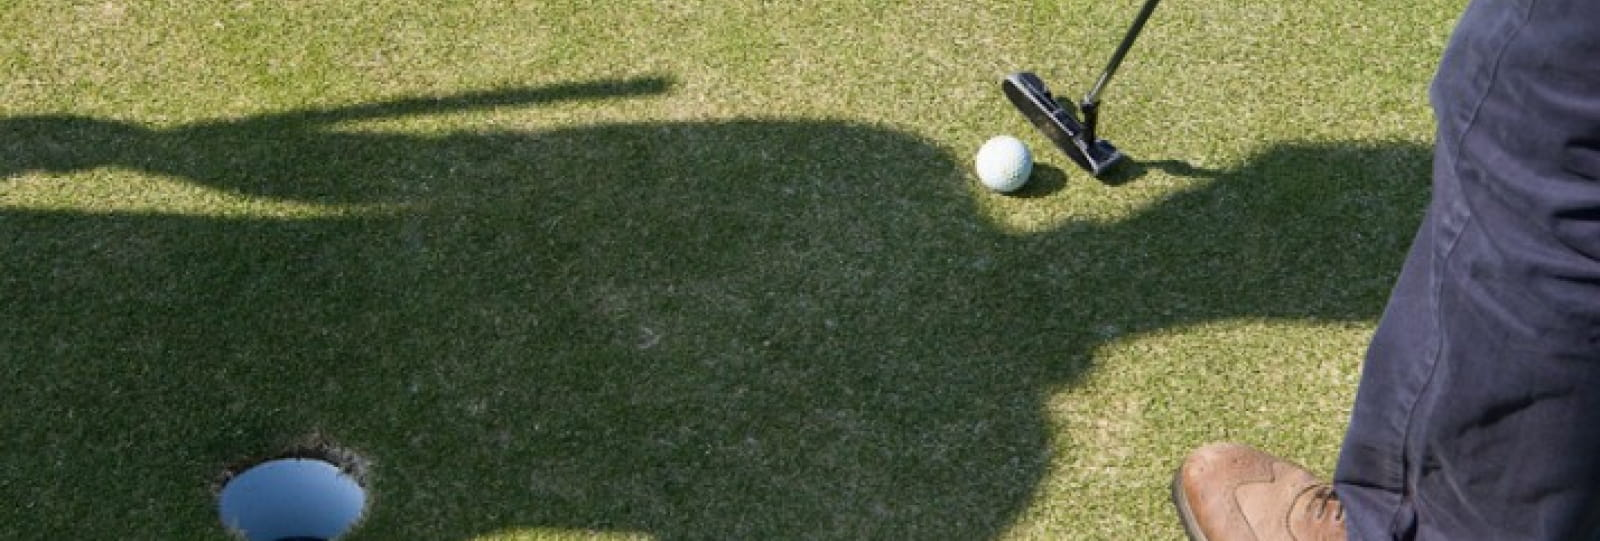 Week-end golf en Drôme provençale